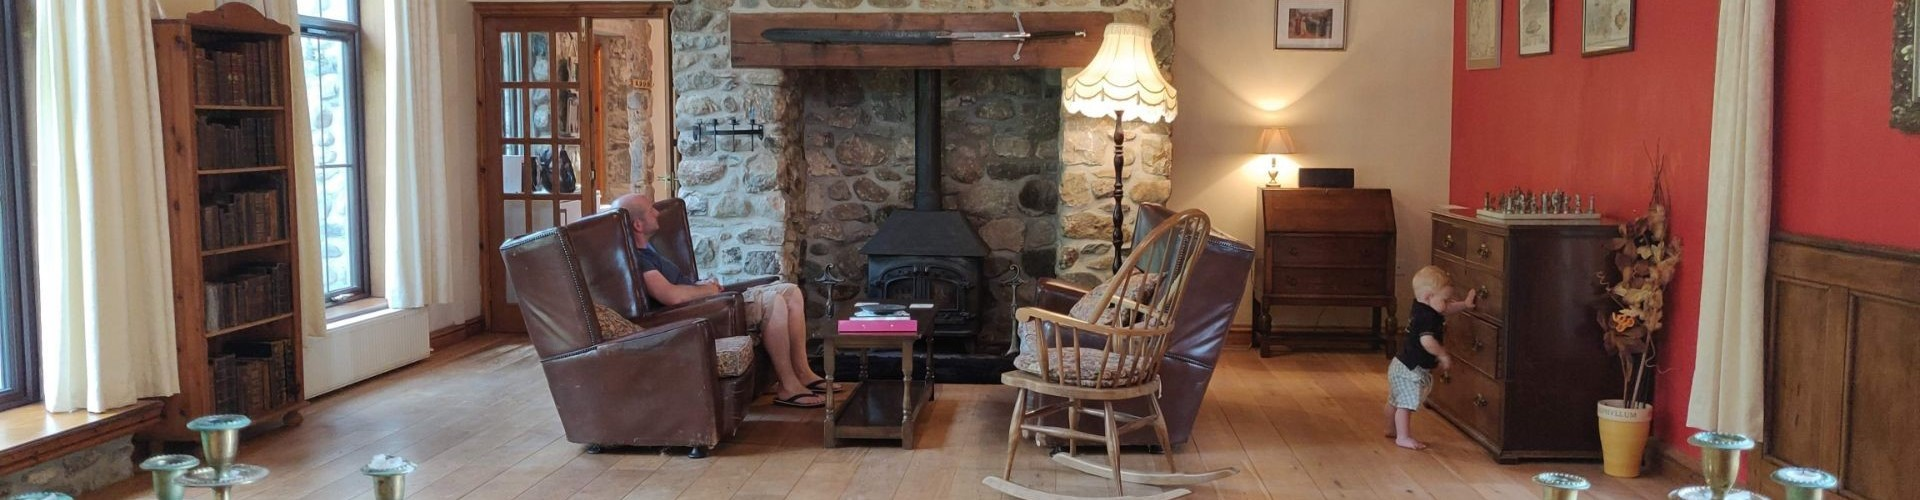 Top 10 kindvriendelijke cottages Wales